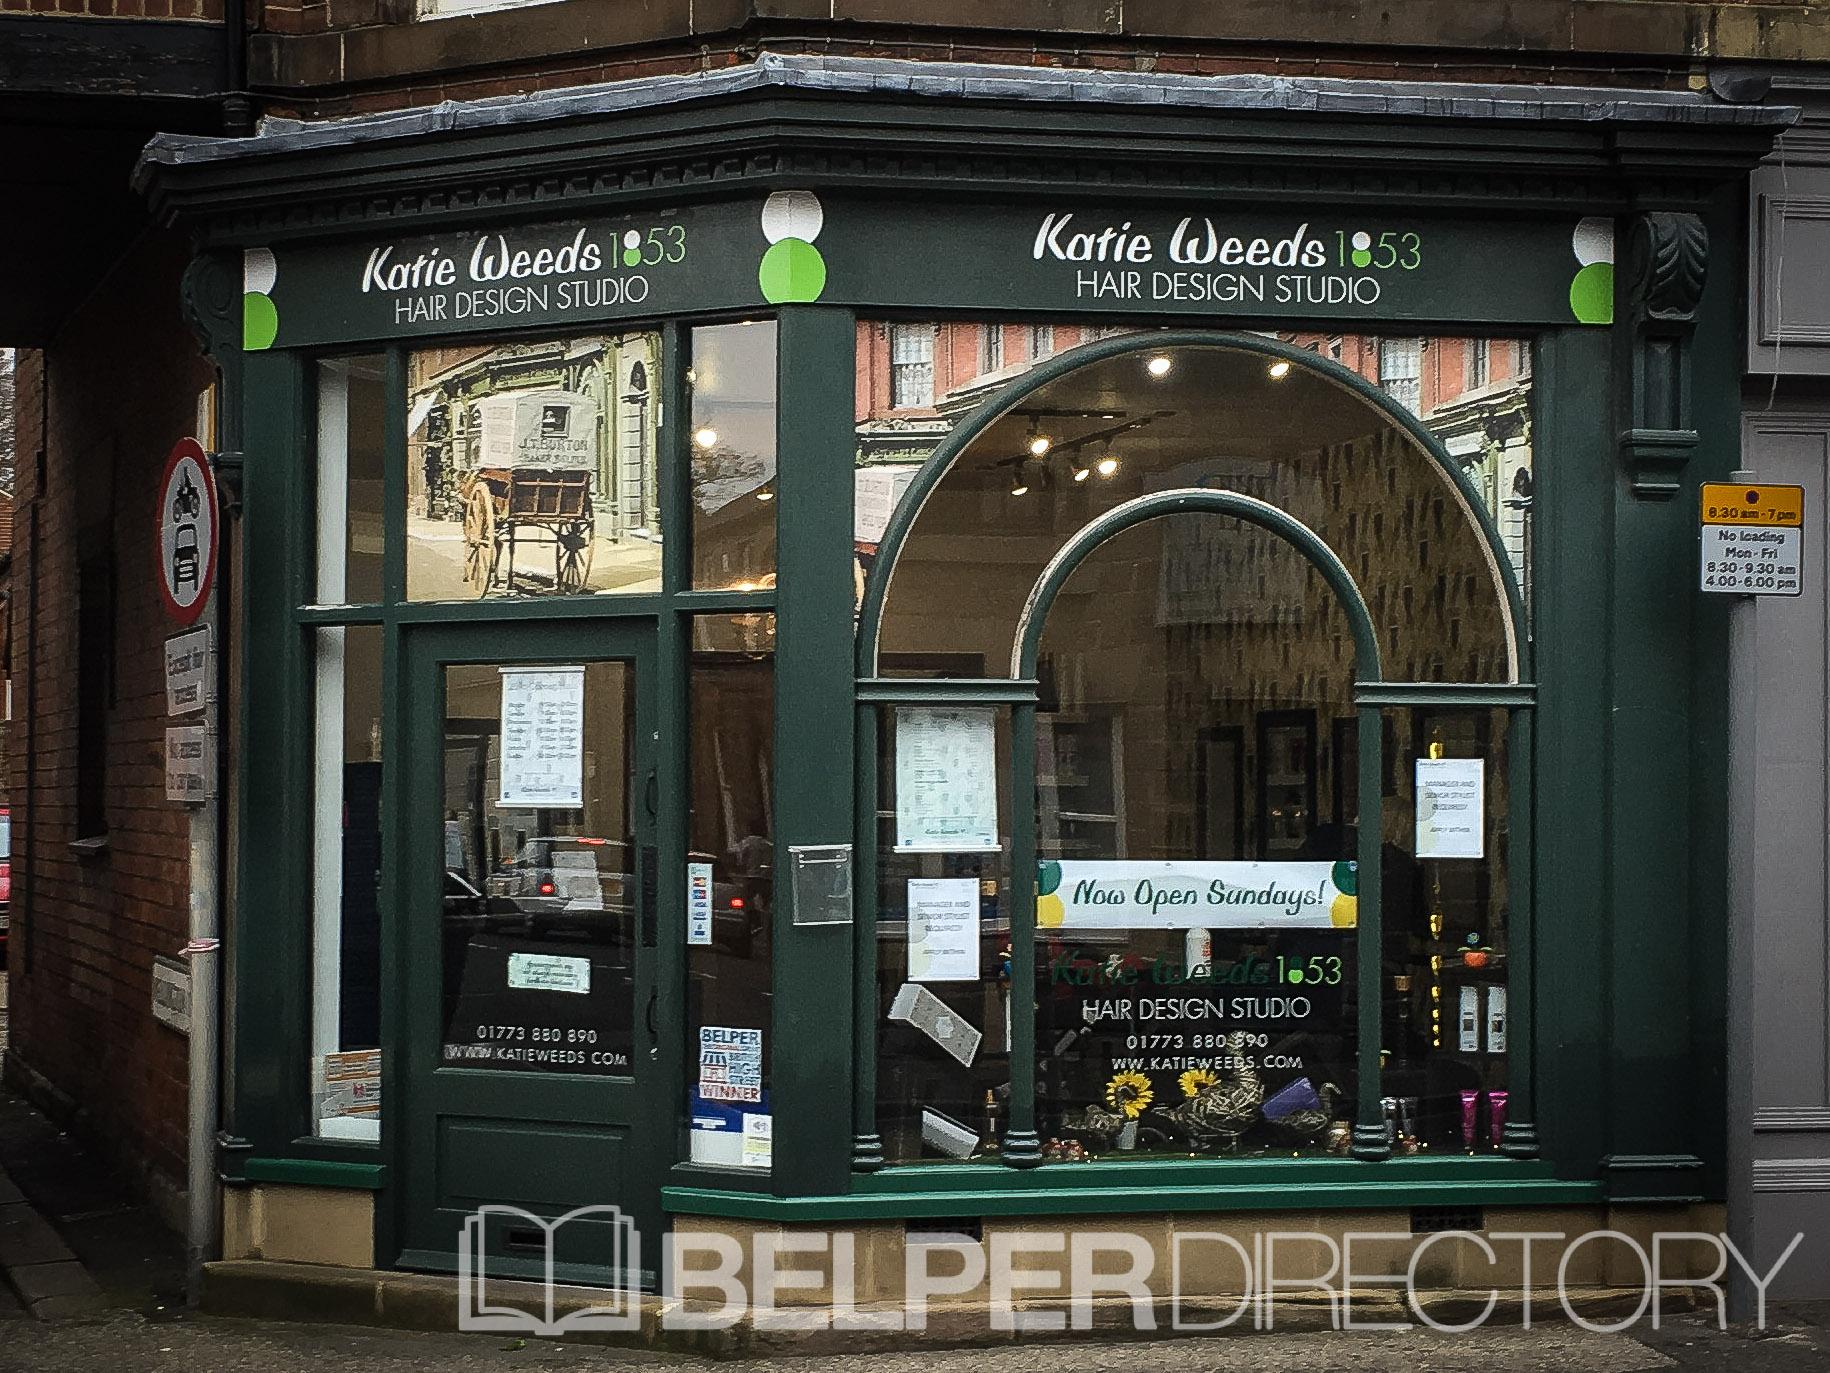 Katie Weeds 1853 Hair Design Studio on Inter Search